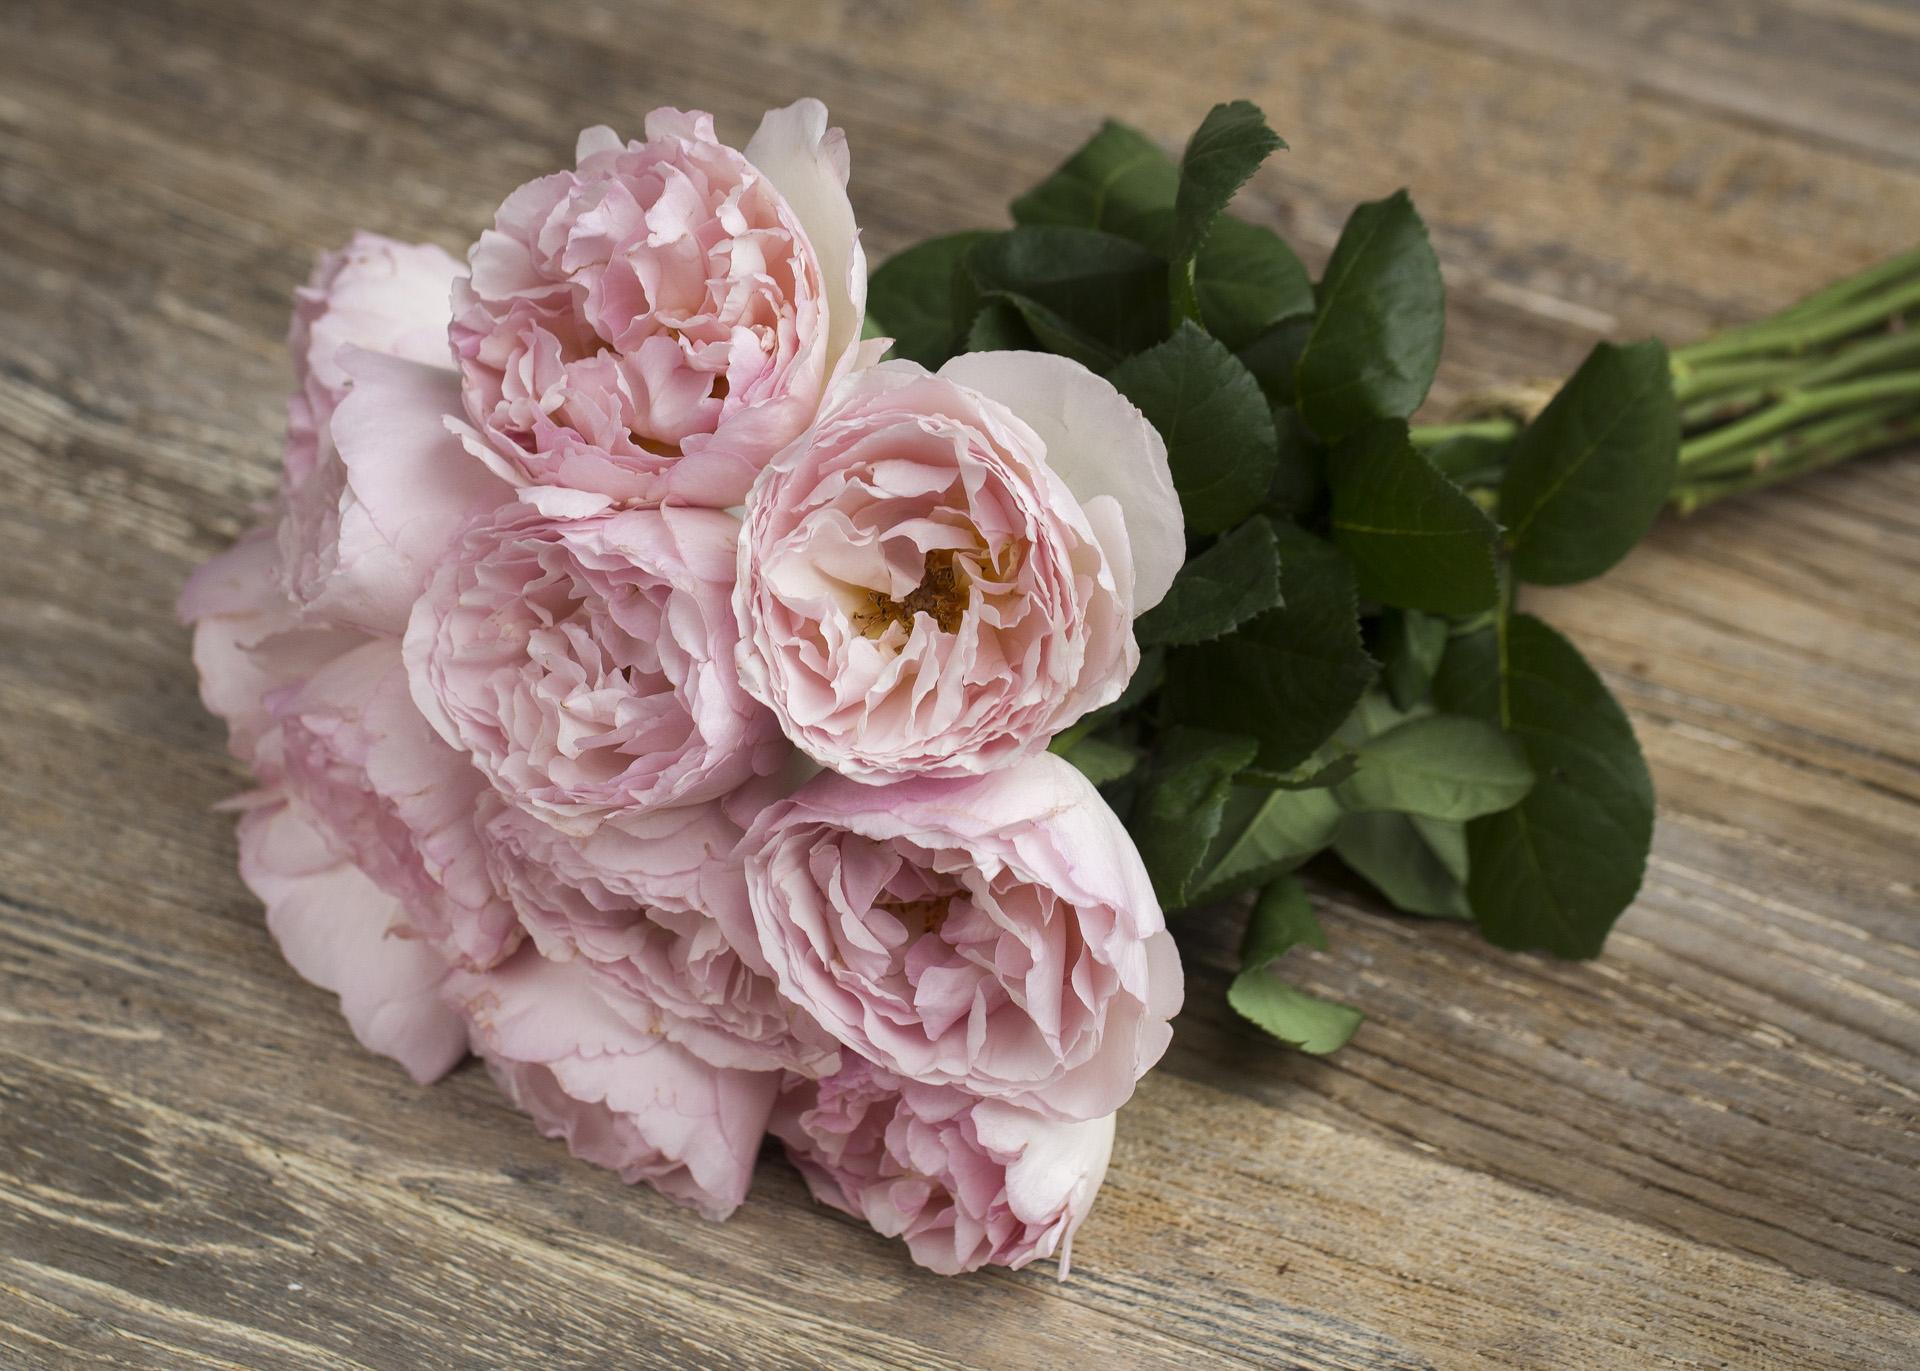 Princesse Charlene de Monaco Roses from the Meilland Jardin & Parfum collection